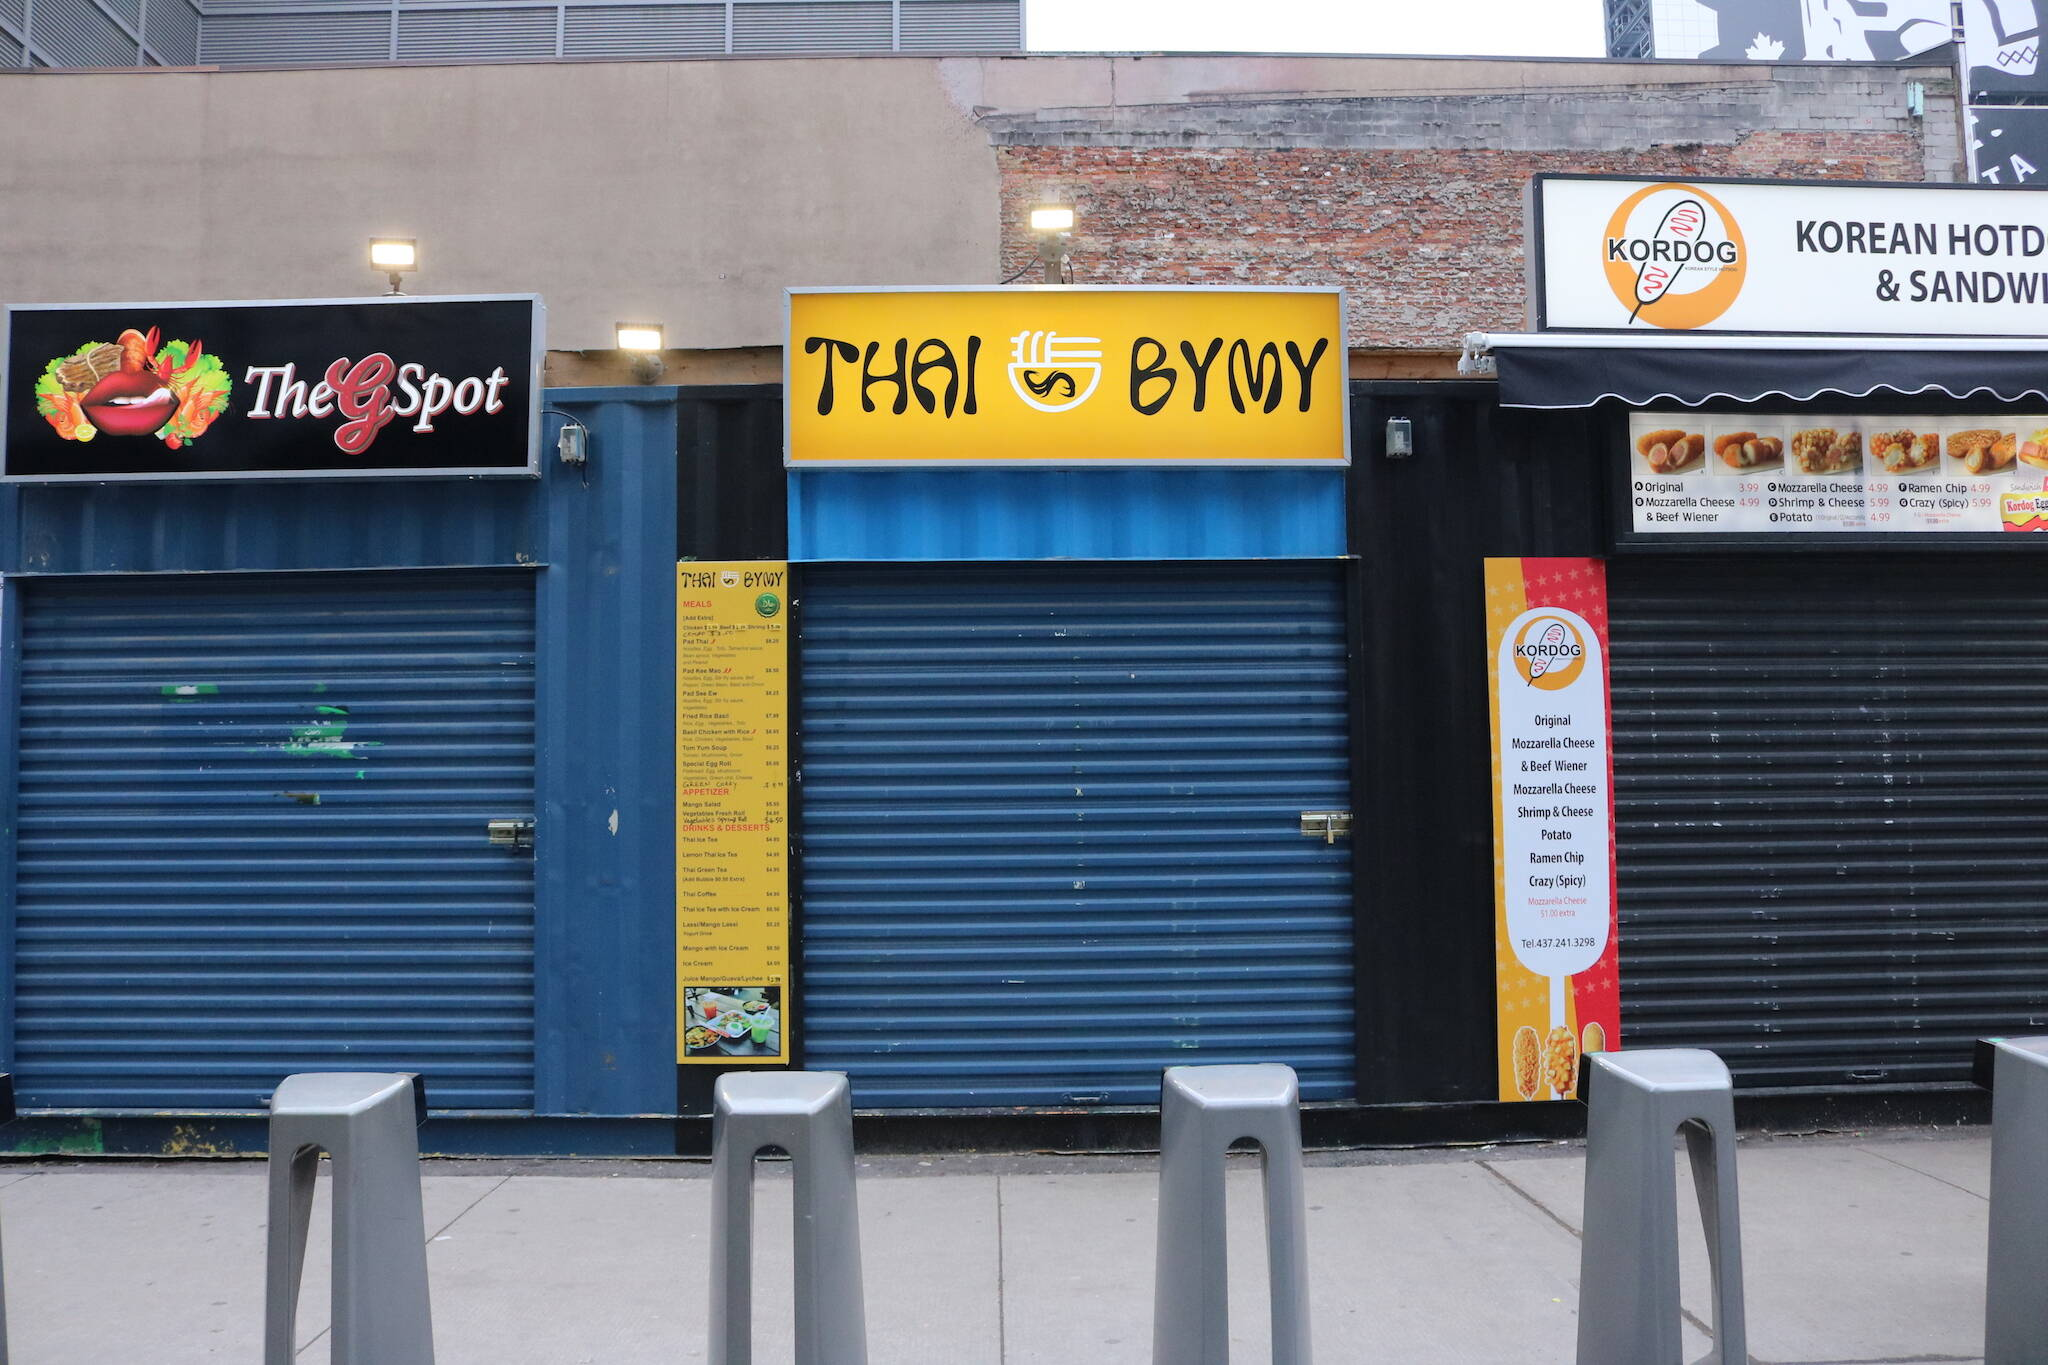 Thai Bymy Toronto